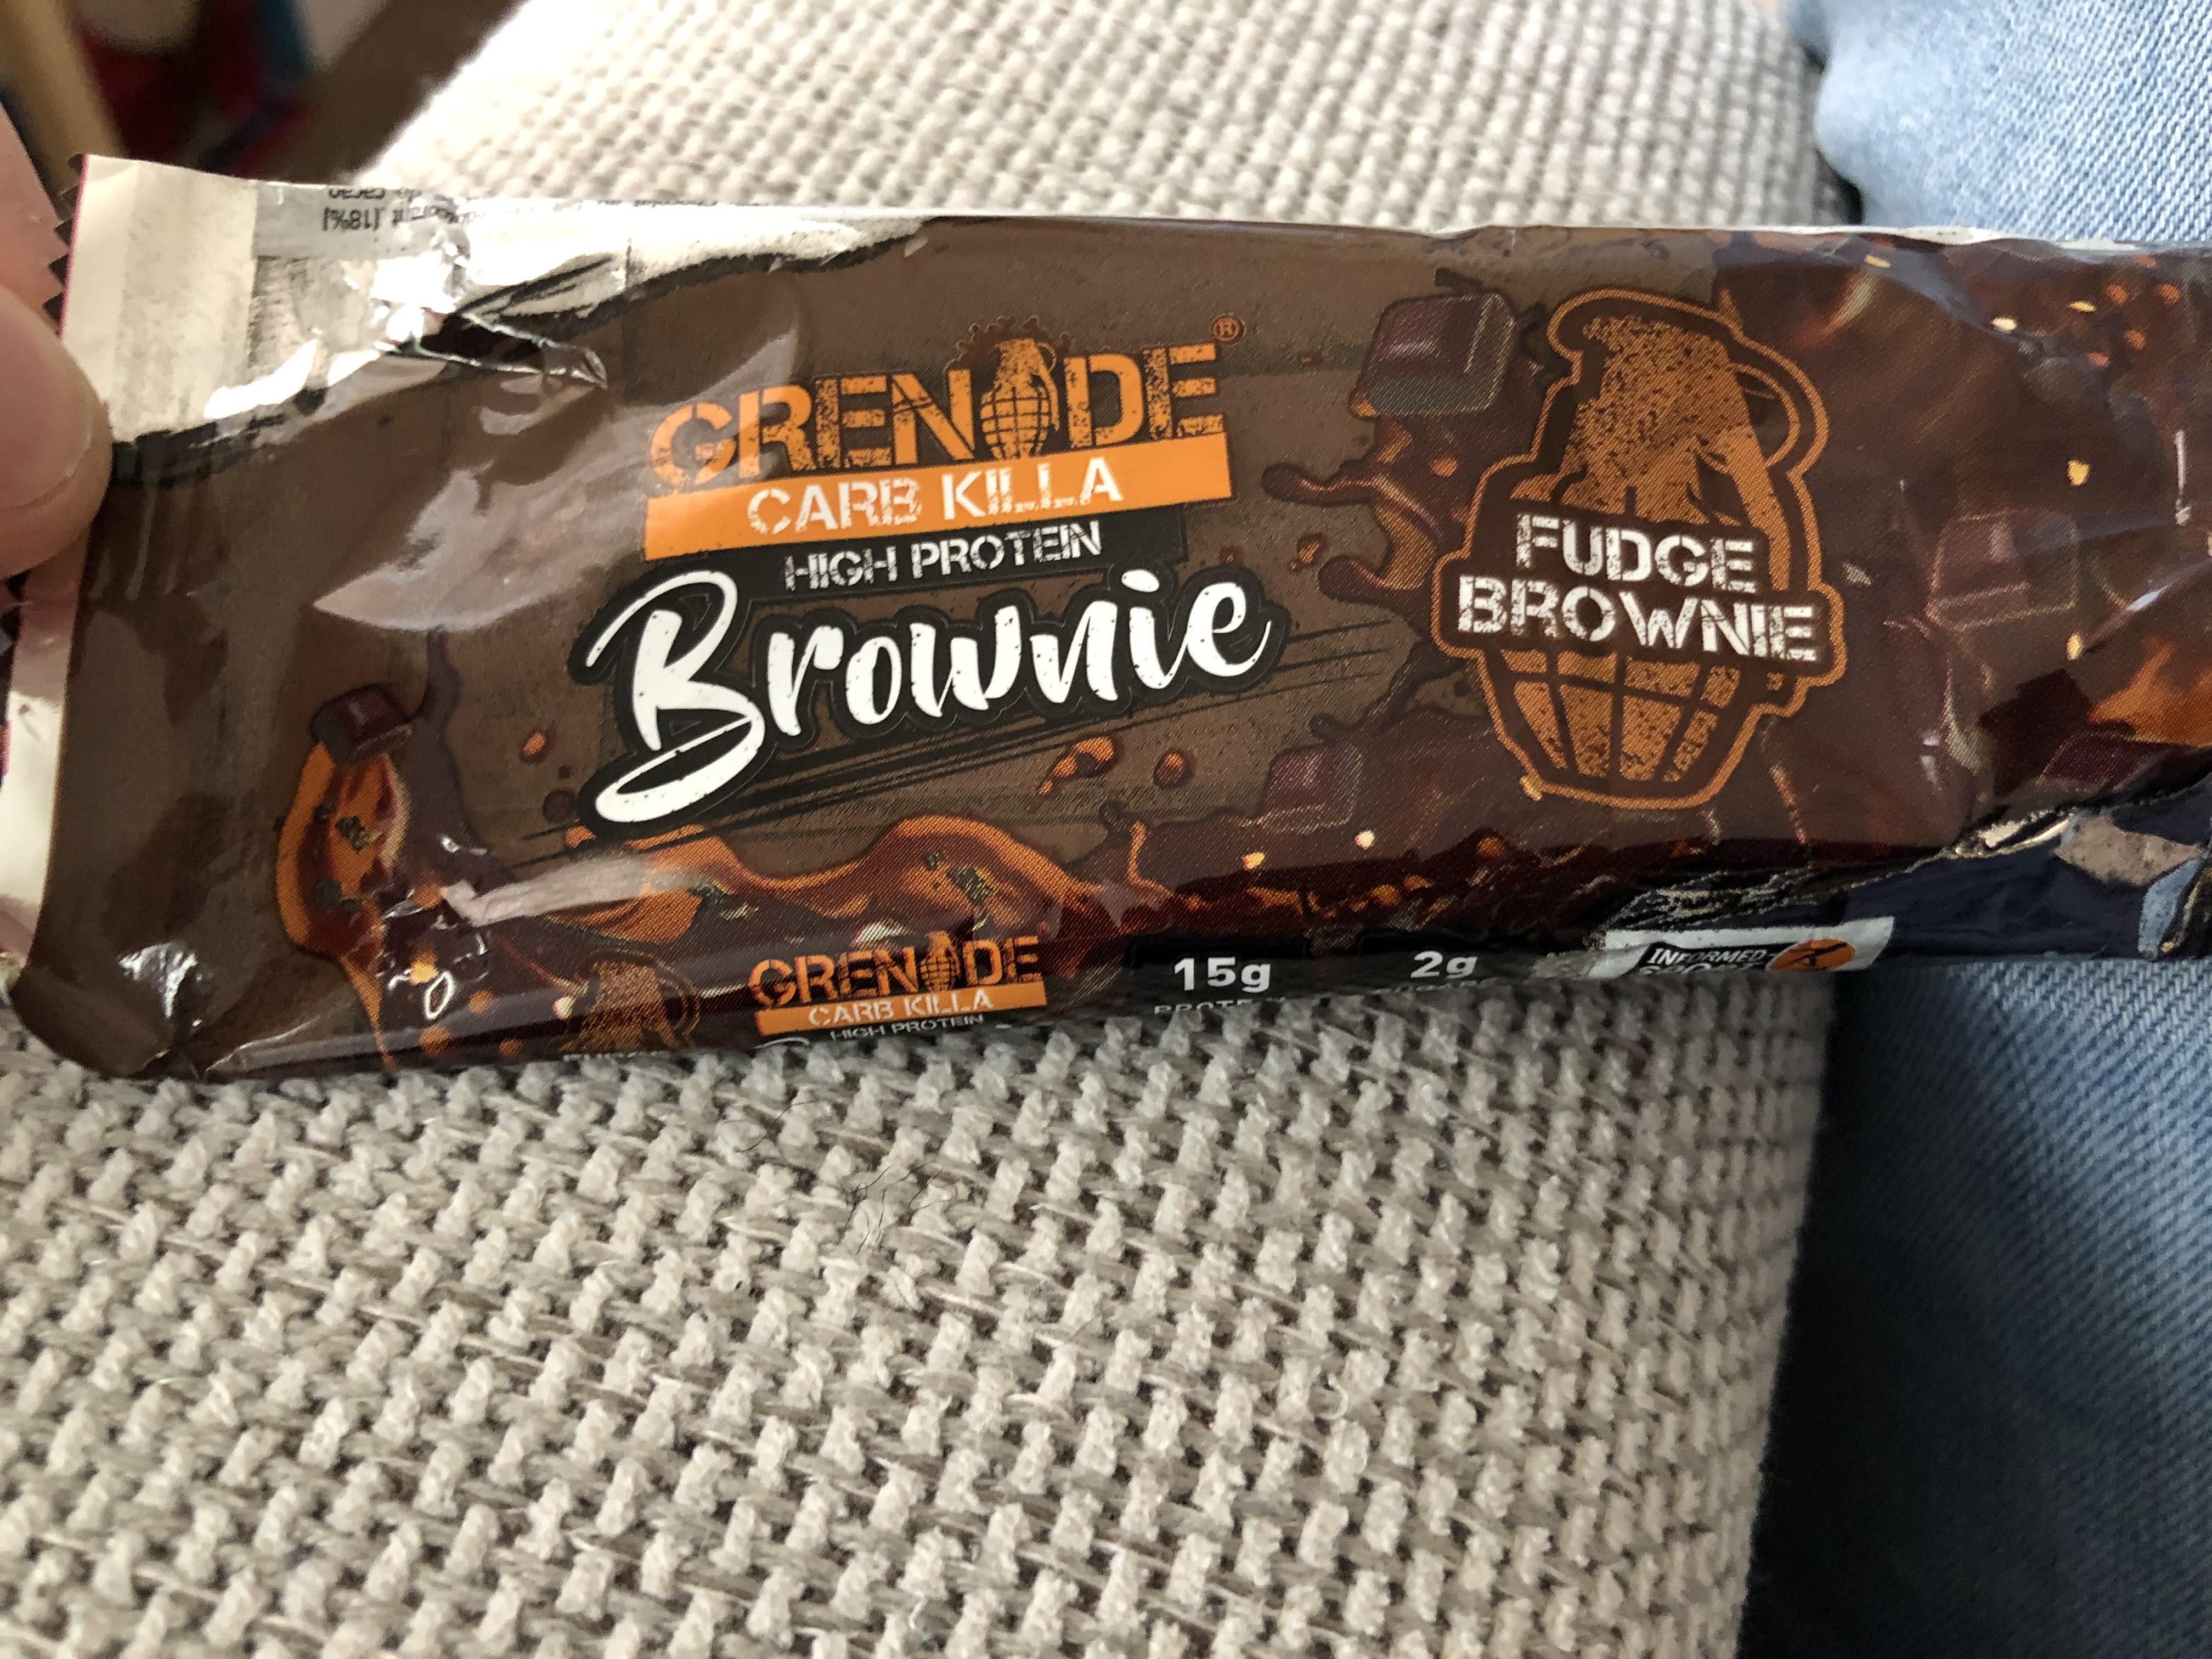 Grenade Carb Killa - 99p Instore @ Home Bargains